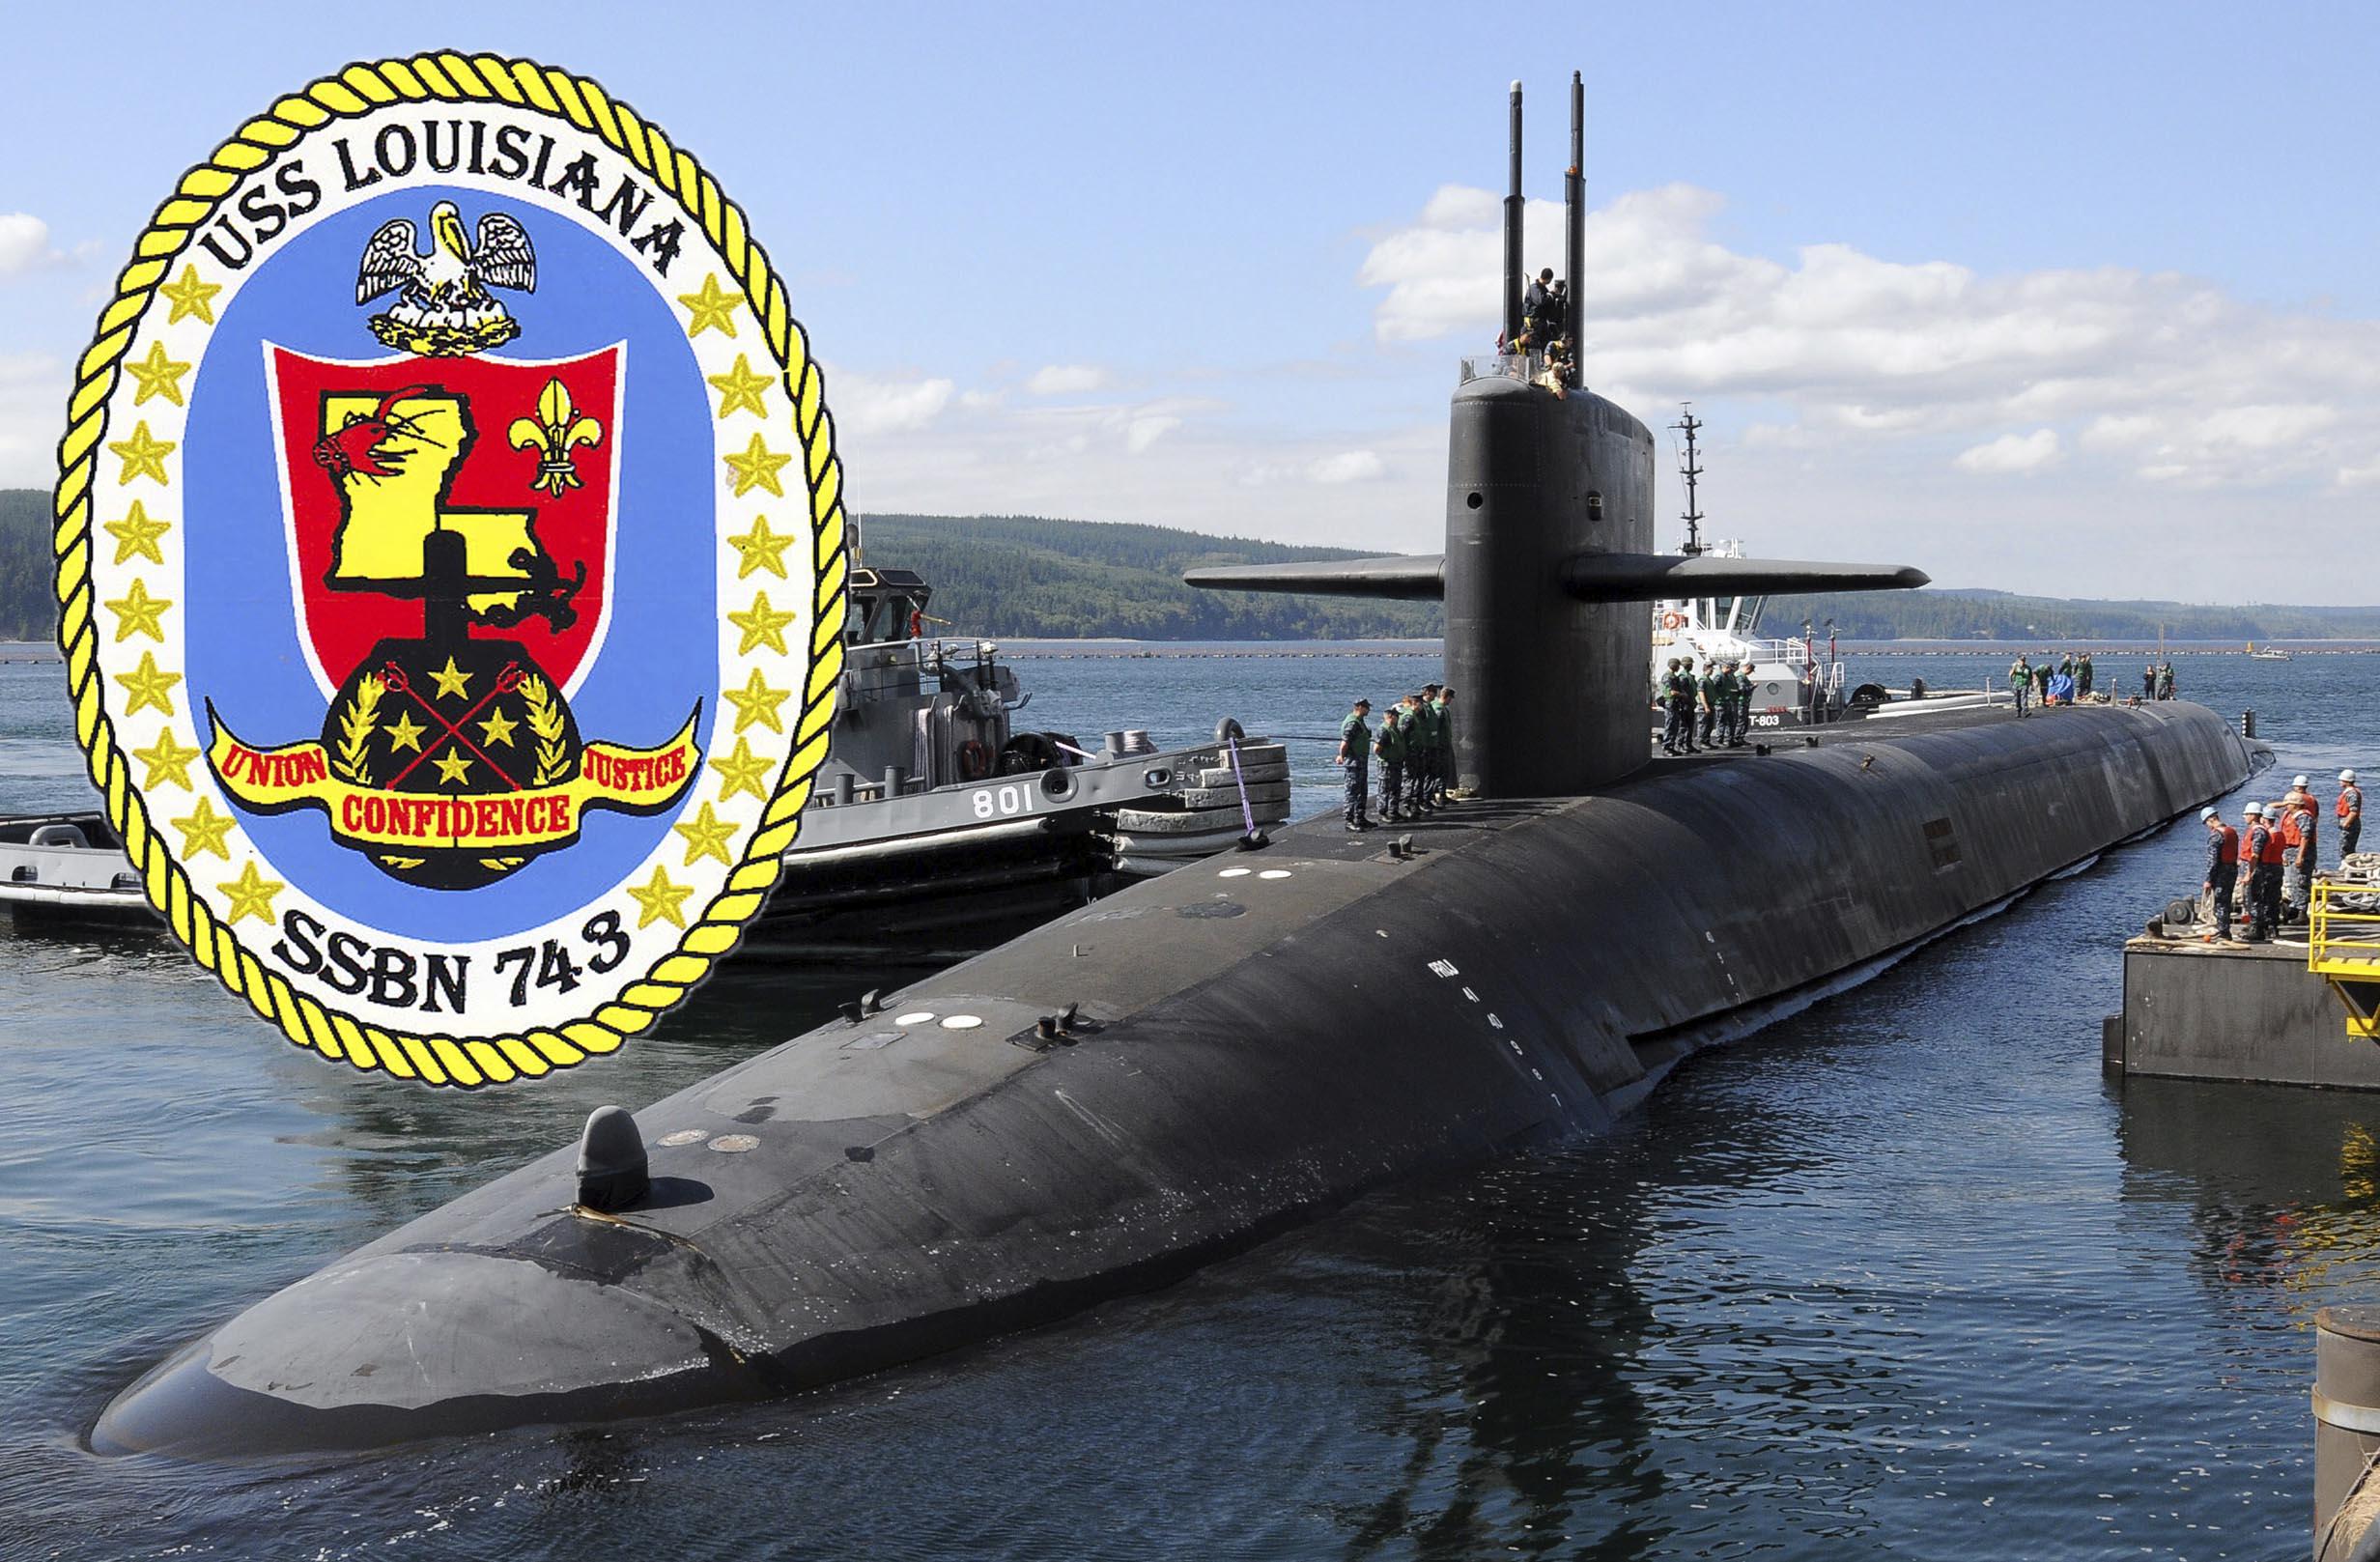 USS LOUISIANA SSBN-743 Bild und Grafik: U.S. Navy